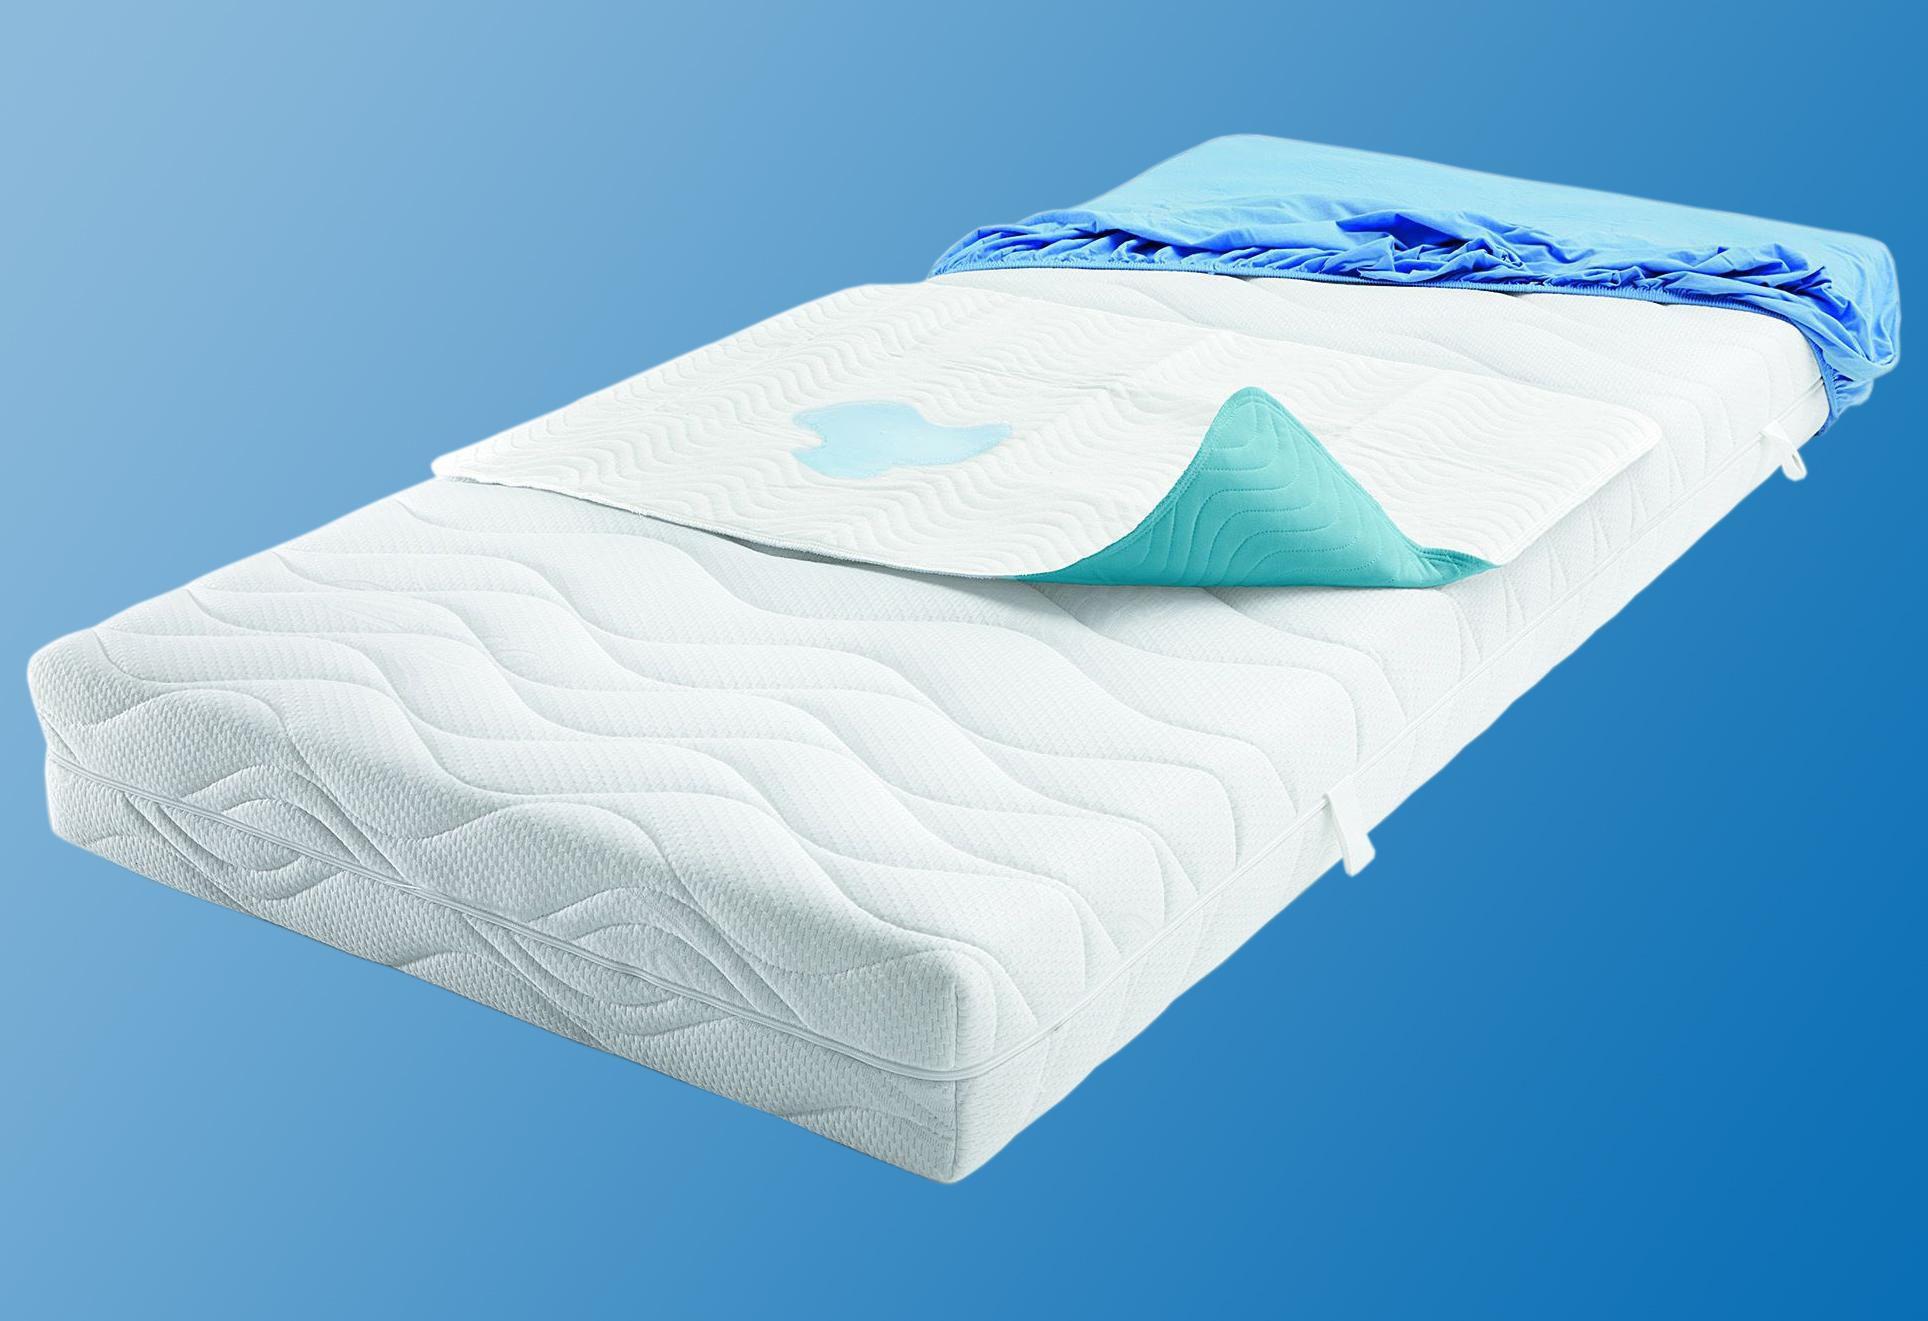 DORMISETTE Inkontinenzauflage, »Dormisette Protect & Care Inkontinenzauflage, 5-lagig«, Dormisette